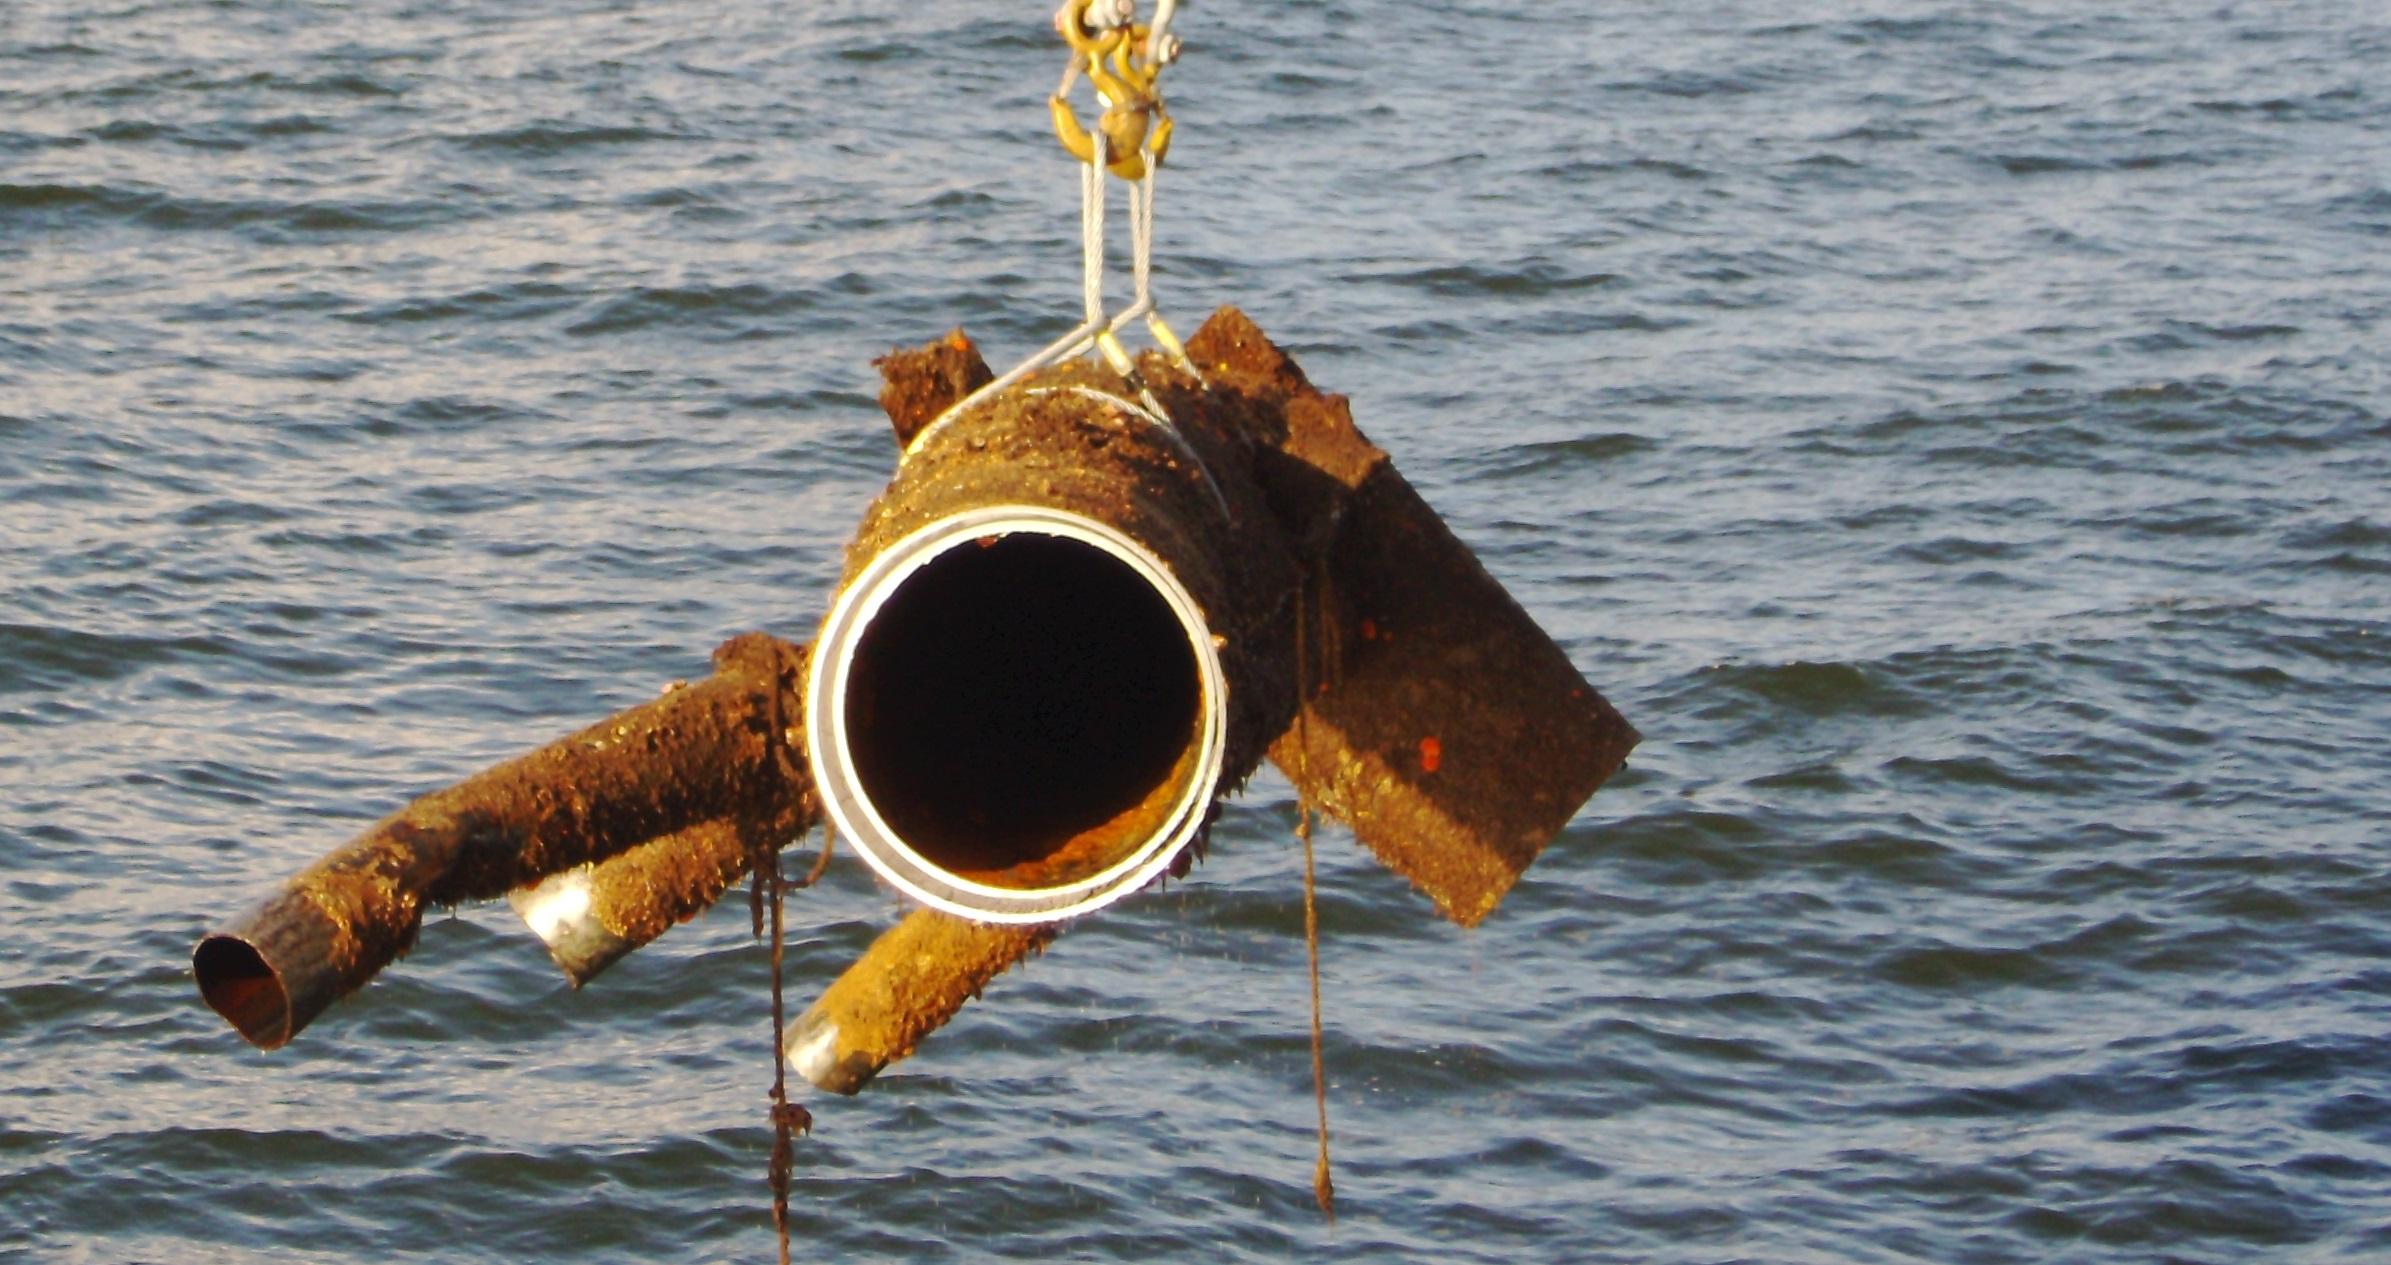 Offshore Decommissioning Underwater_Leg_Cut